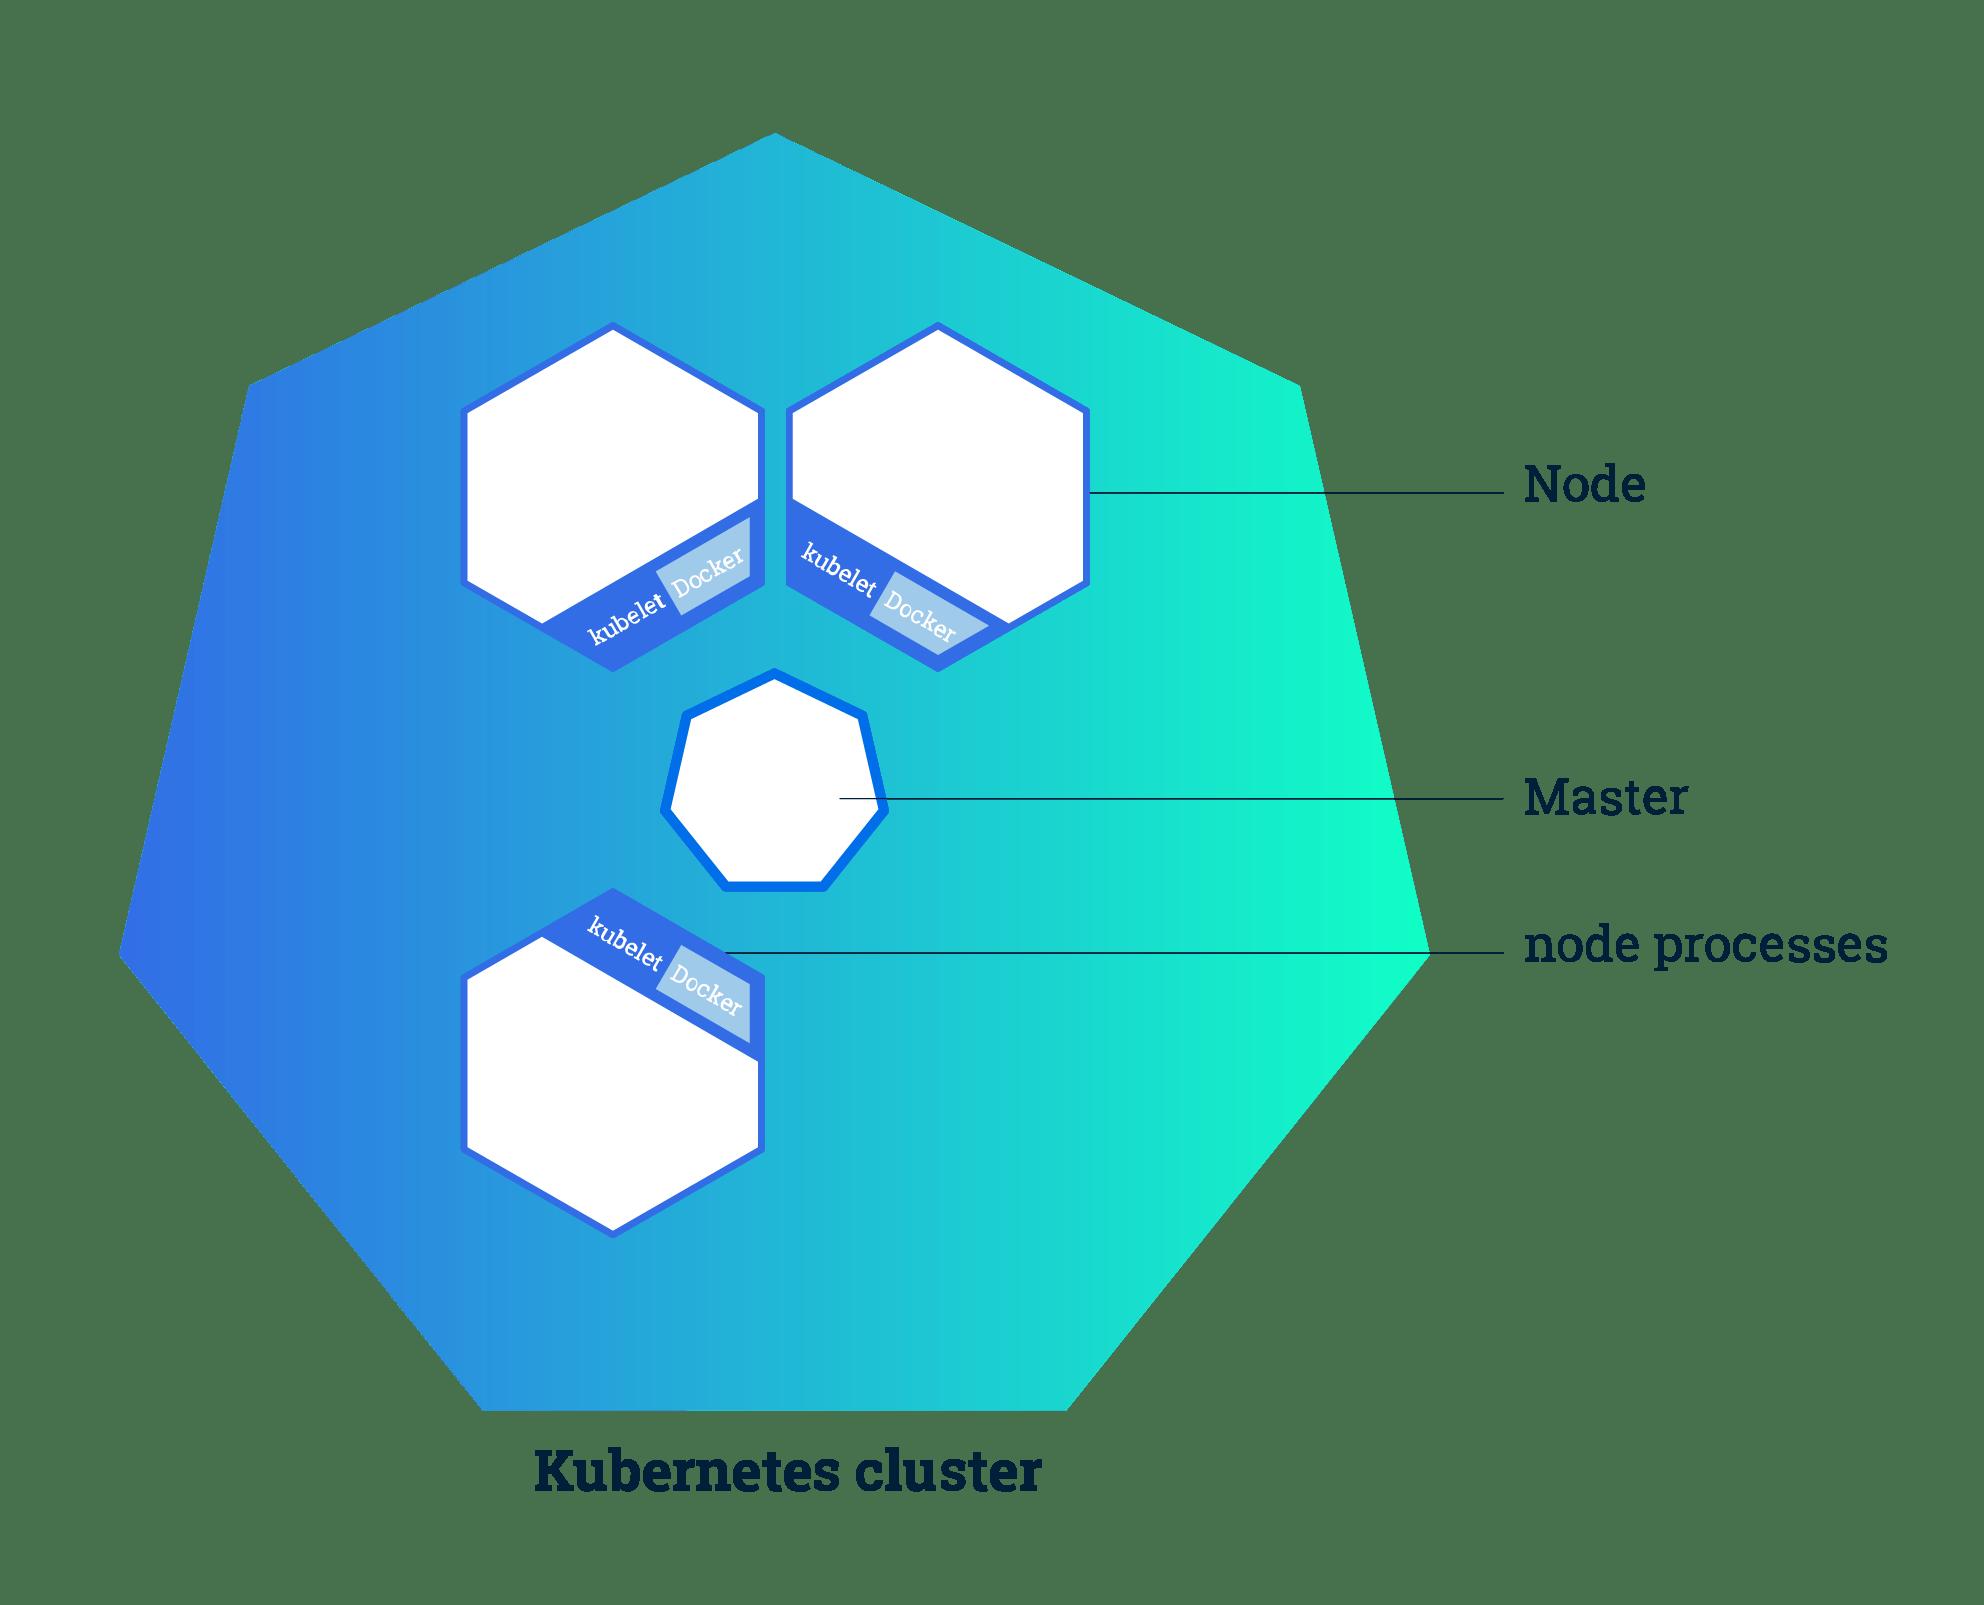 Blog: Running Kubernetes locally on Linux with Minikube